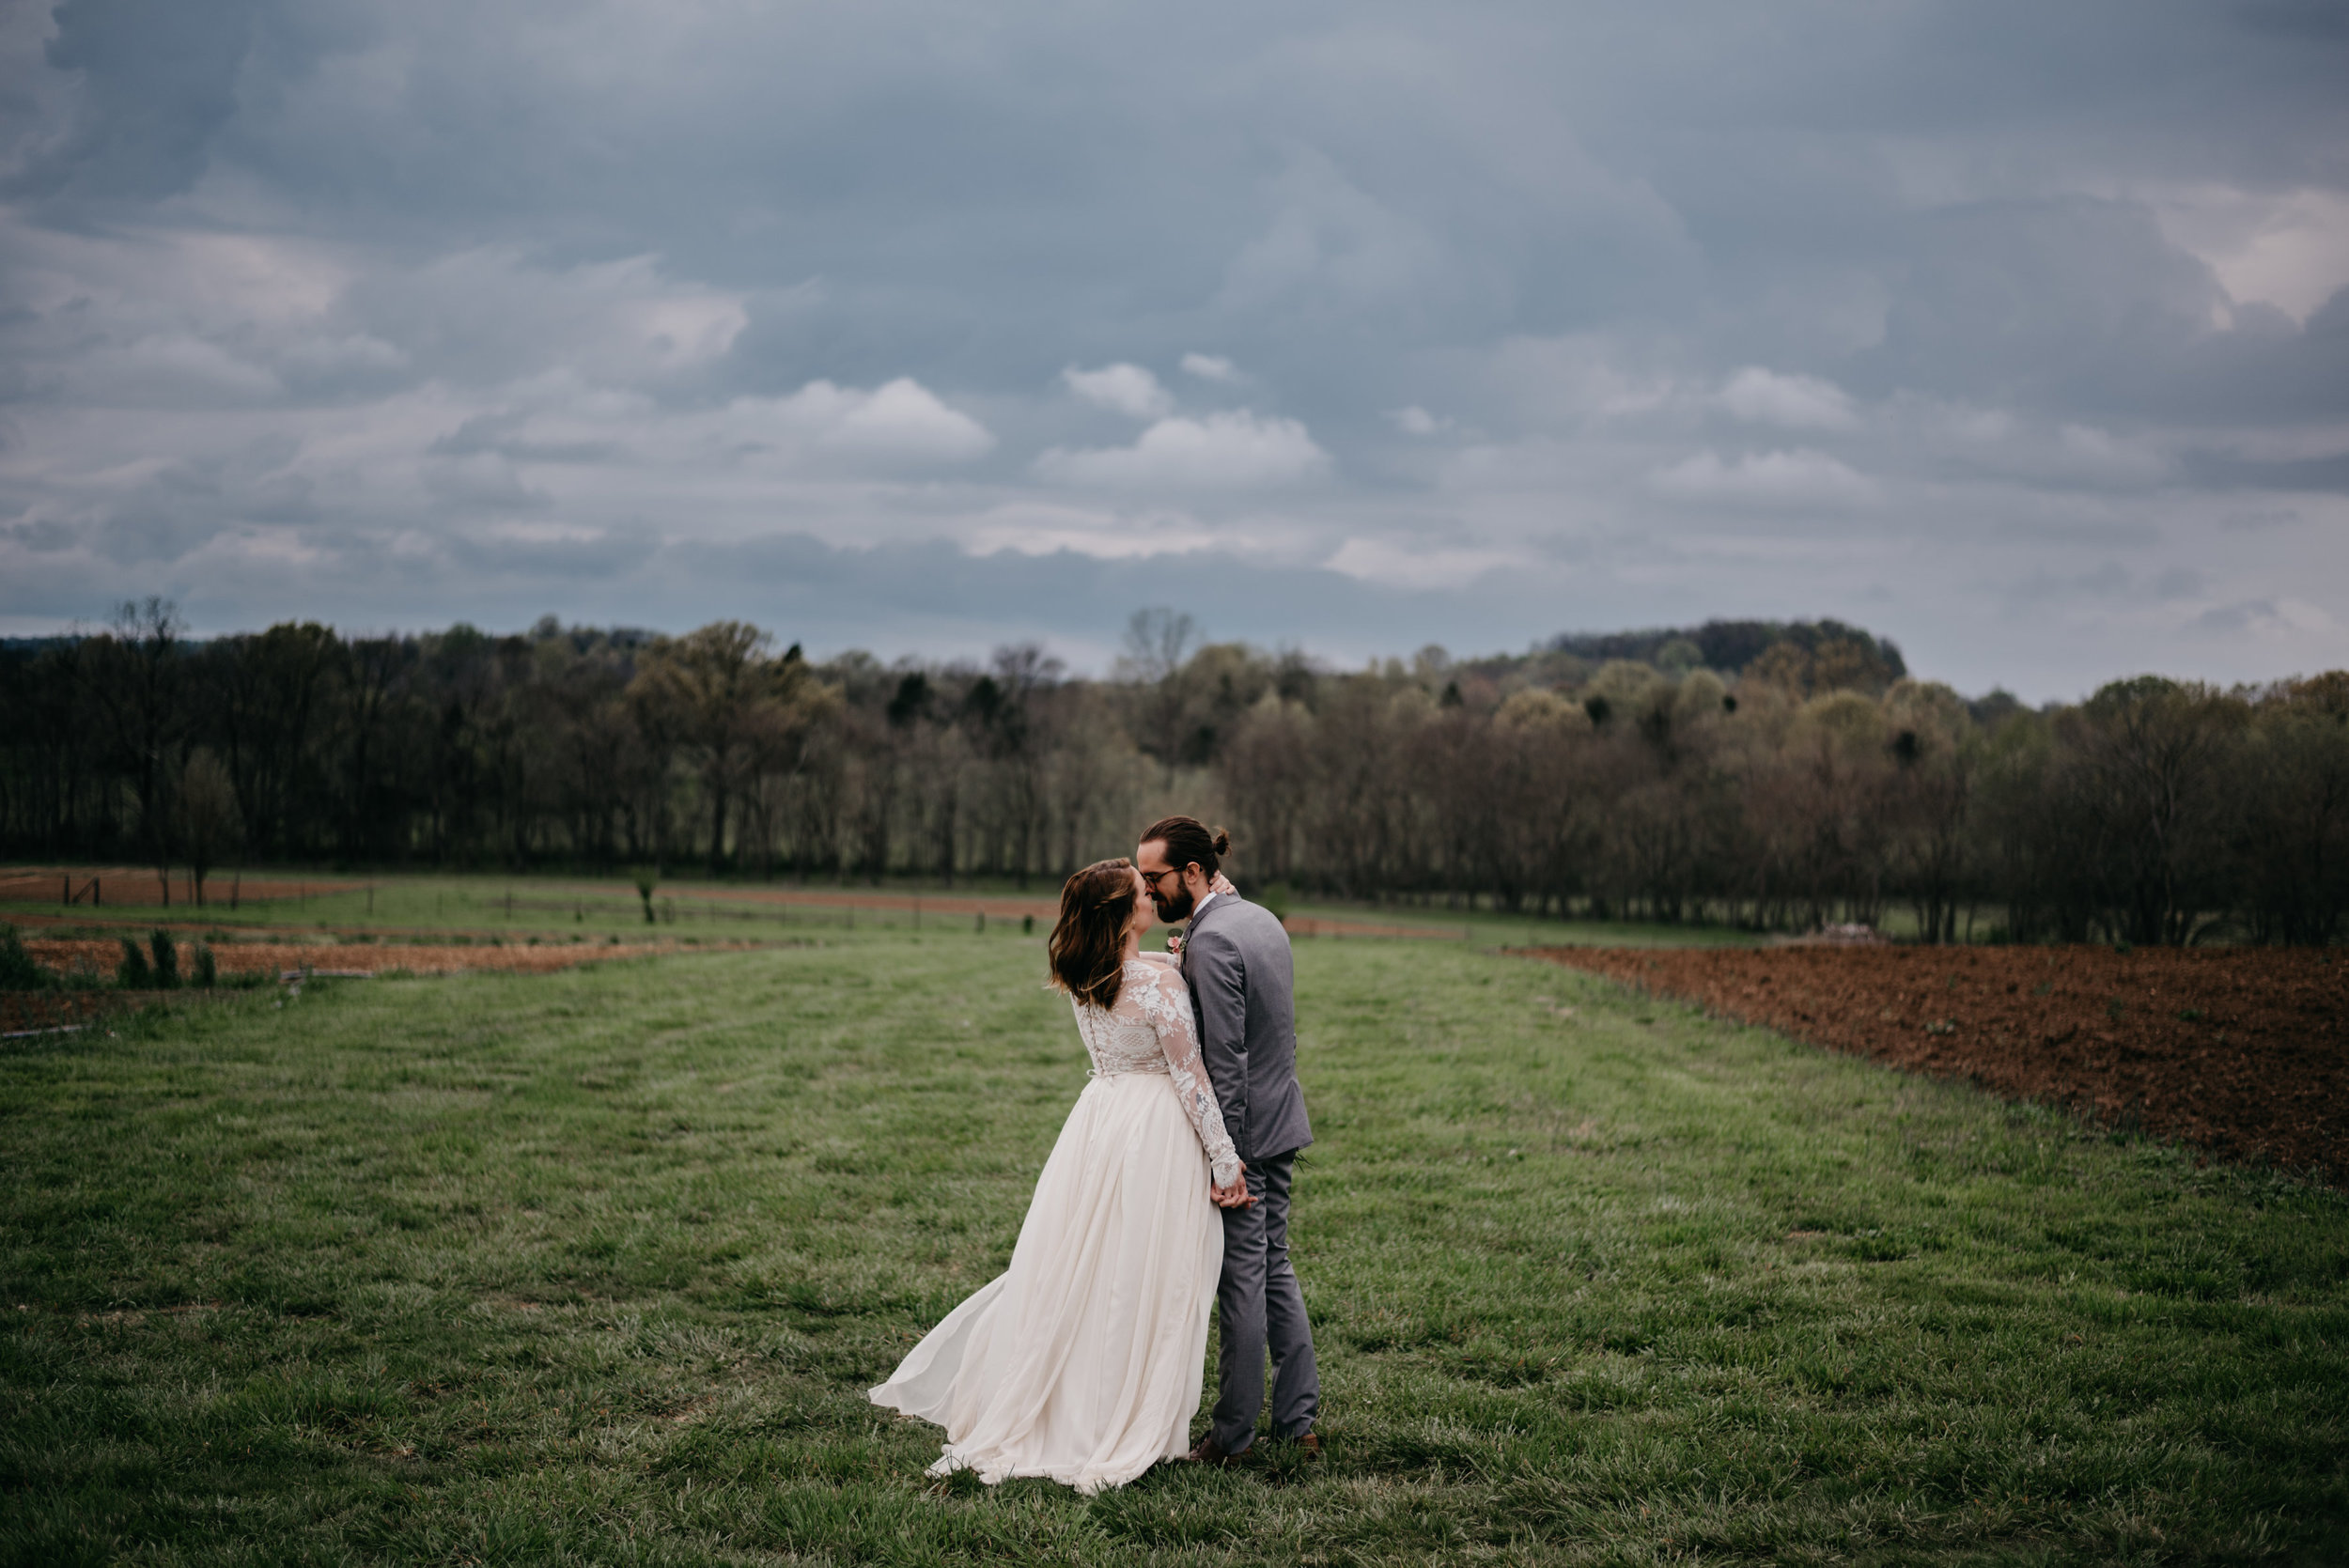 Allenbrooke-Farms-Nashville-Wedding-Photographers 26.jpg